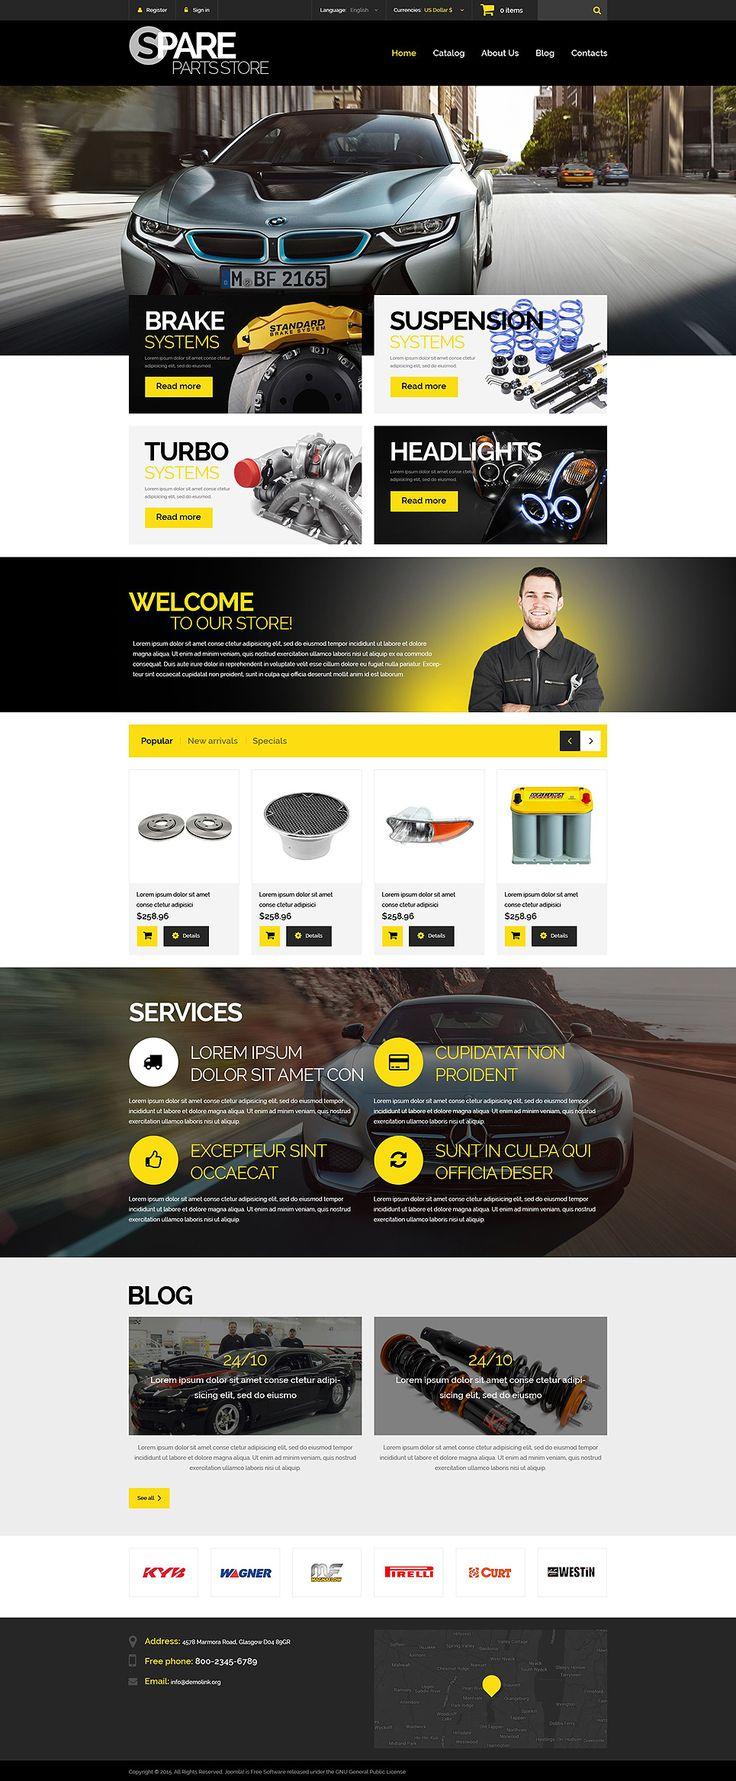 #Auto Parts Responsive #PrestaShop Theme #cars http://www.templatemonster.com/prestashop-themes/54986.html?utm_source=pinterest&utm_medium=timeline&utm_campaign=54986